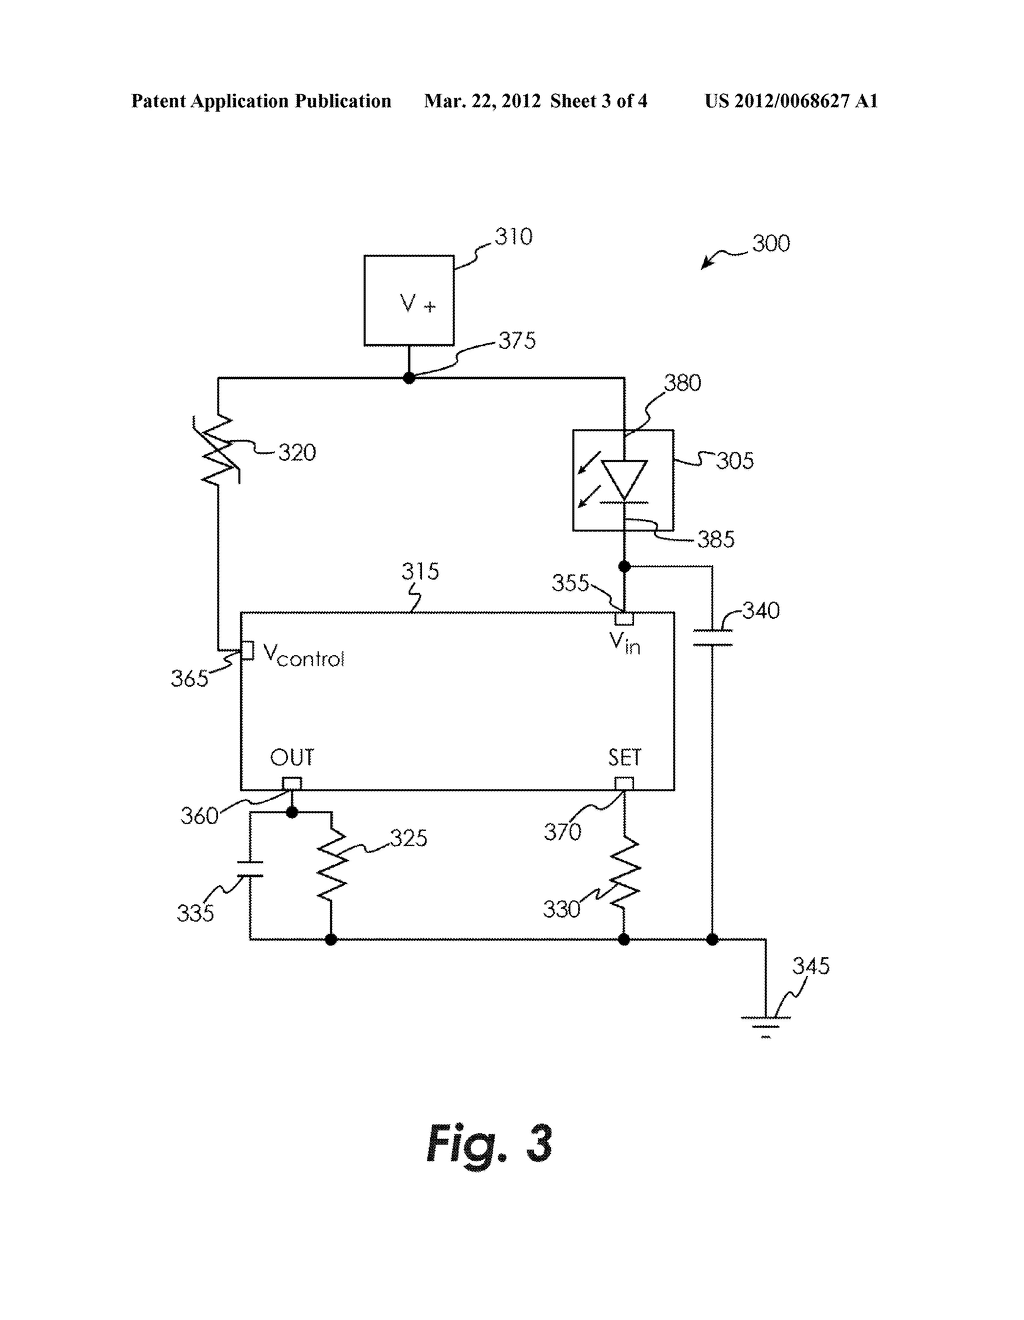 Led Constant Current Source Triac Lamp Dimmer Circuit Diagram Tradeoficcom Temperature Compensated Schematic And Image 1024x1320